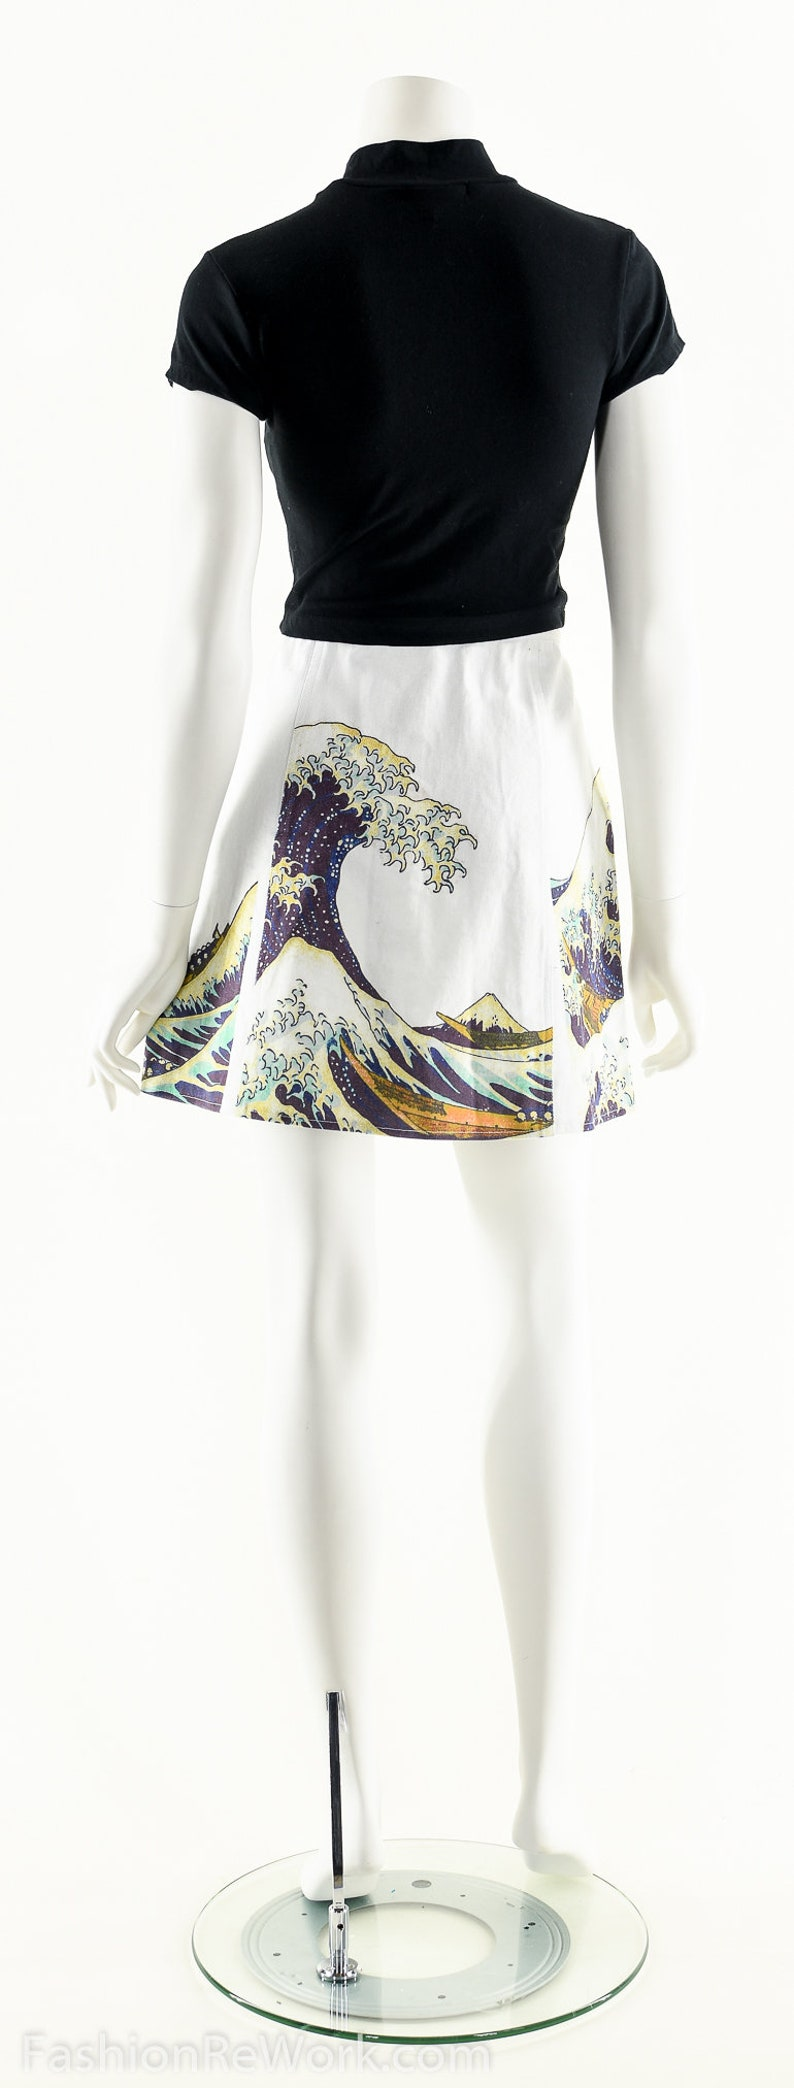 The Great Wave Skirt,90s Snap Front Skater Mini Skirt,90s Club Kid Skirt,Art Print Skirt,The Great Wave Off Kanagawa,Hokusai,Japanese Wave